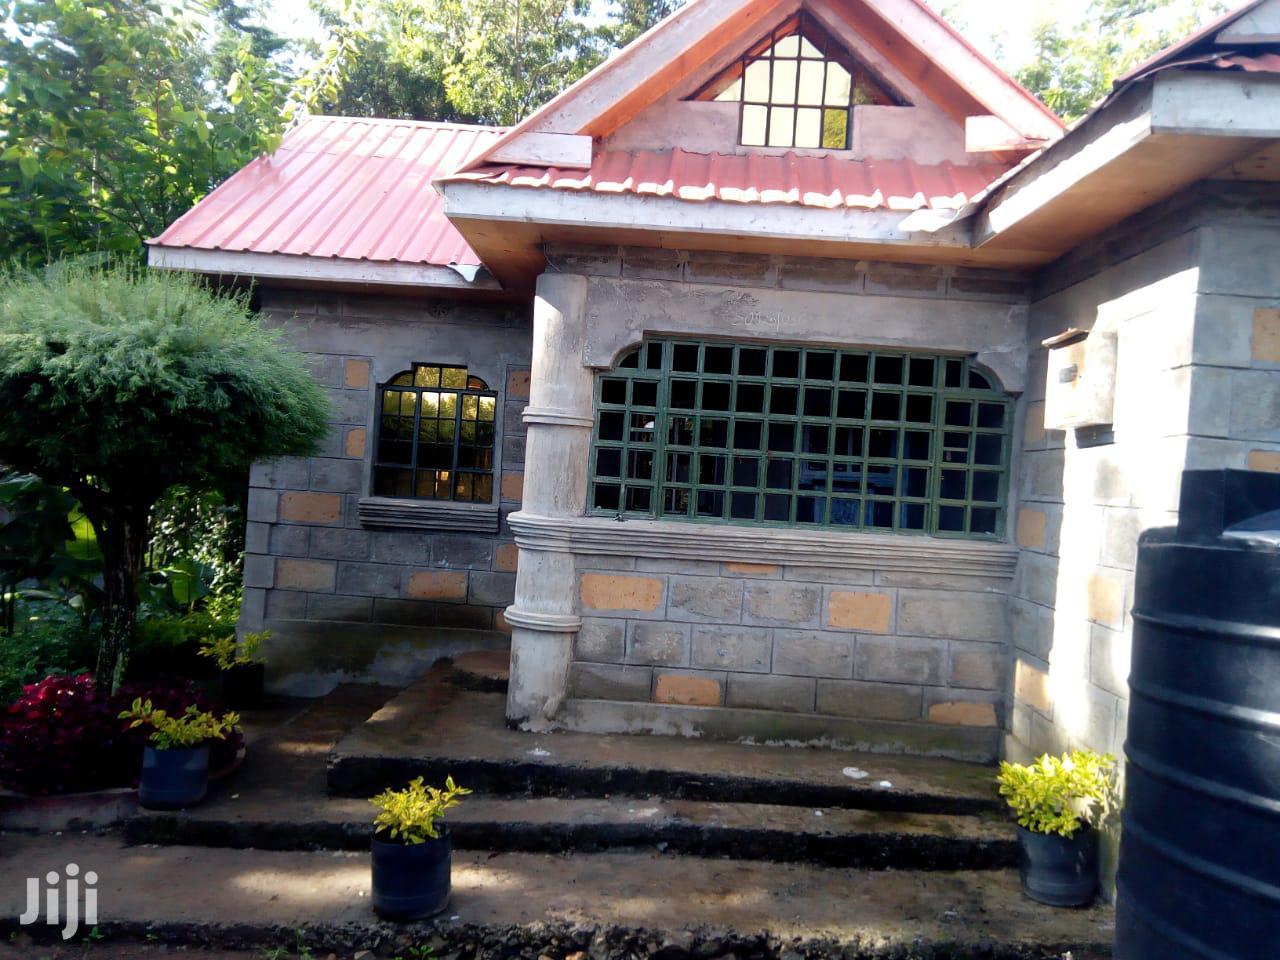 2 Bedroom Bungalow 4 Sale in Runda Nyahururu